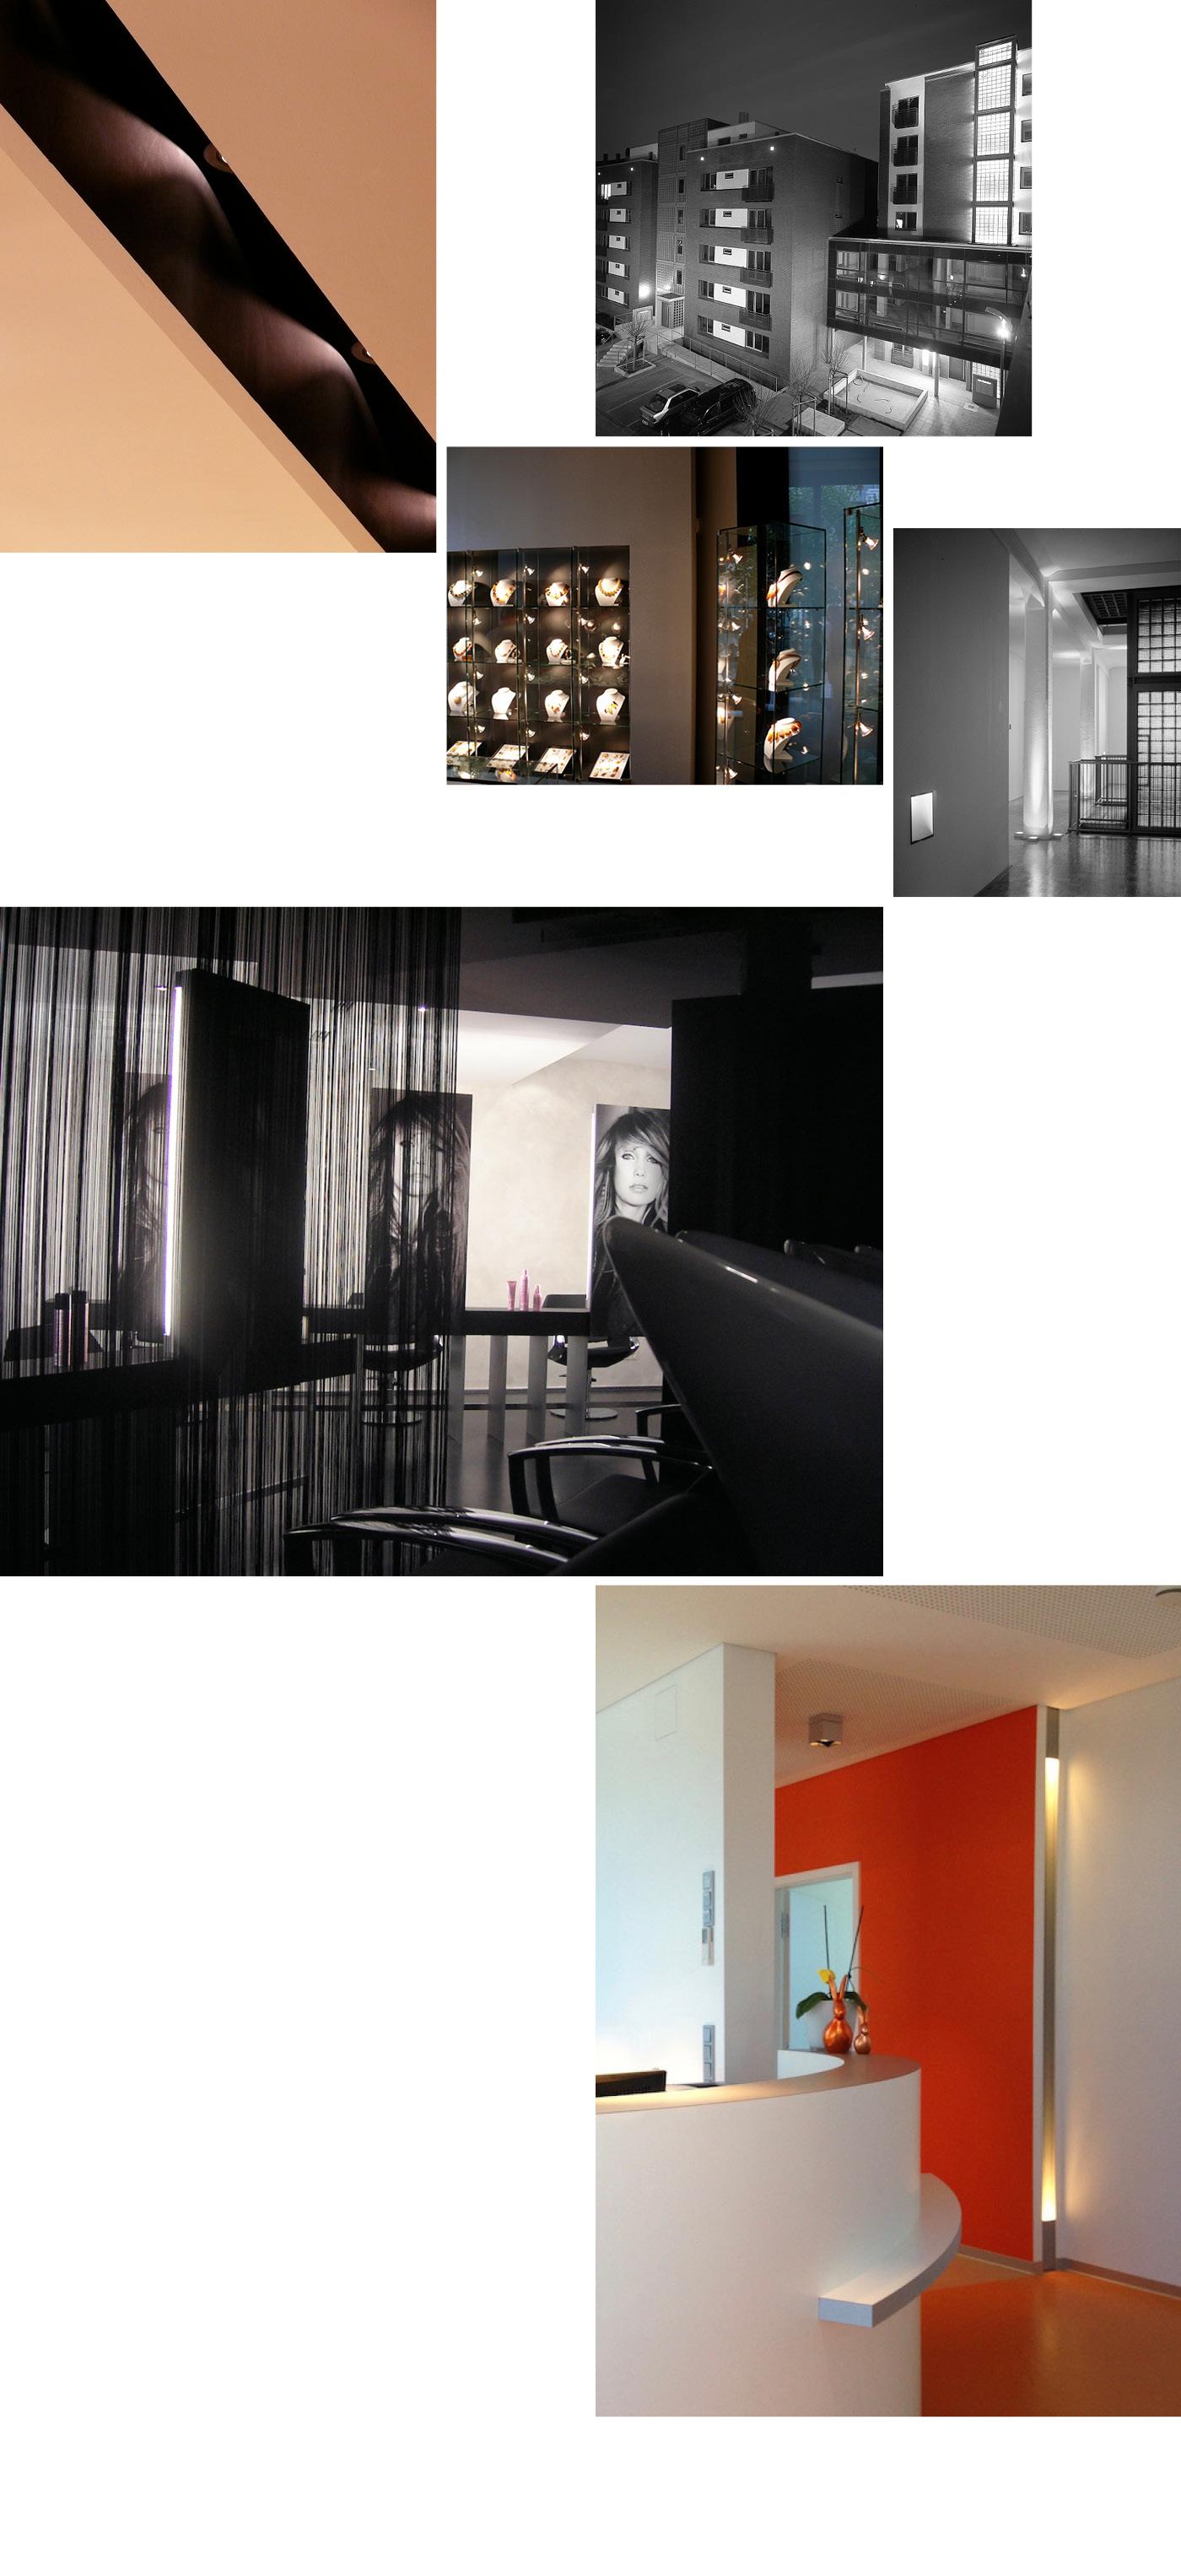 neikes architekturen design. Black Bedroom Furniture Sets. Home Design Ideas